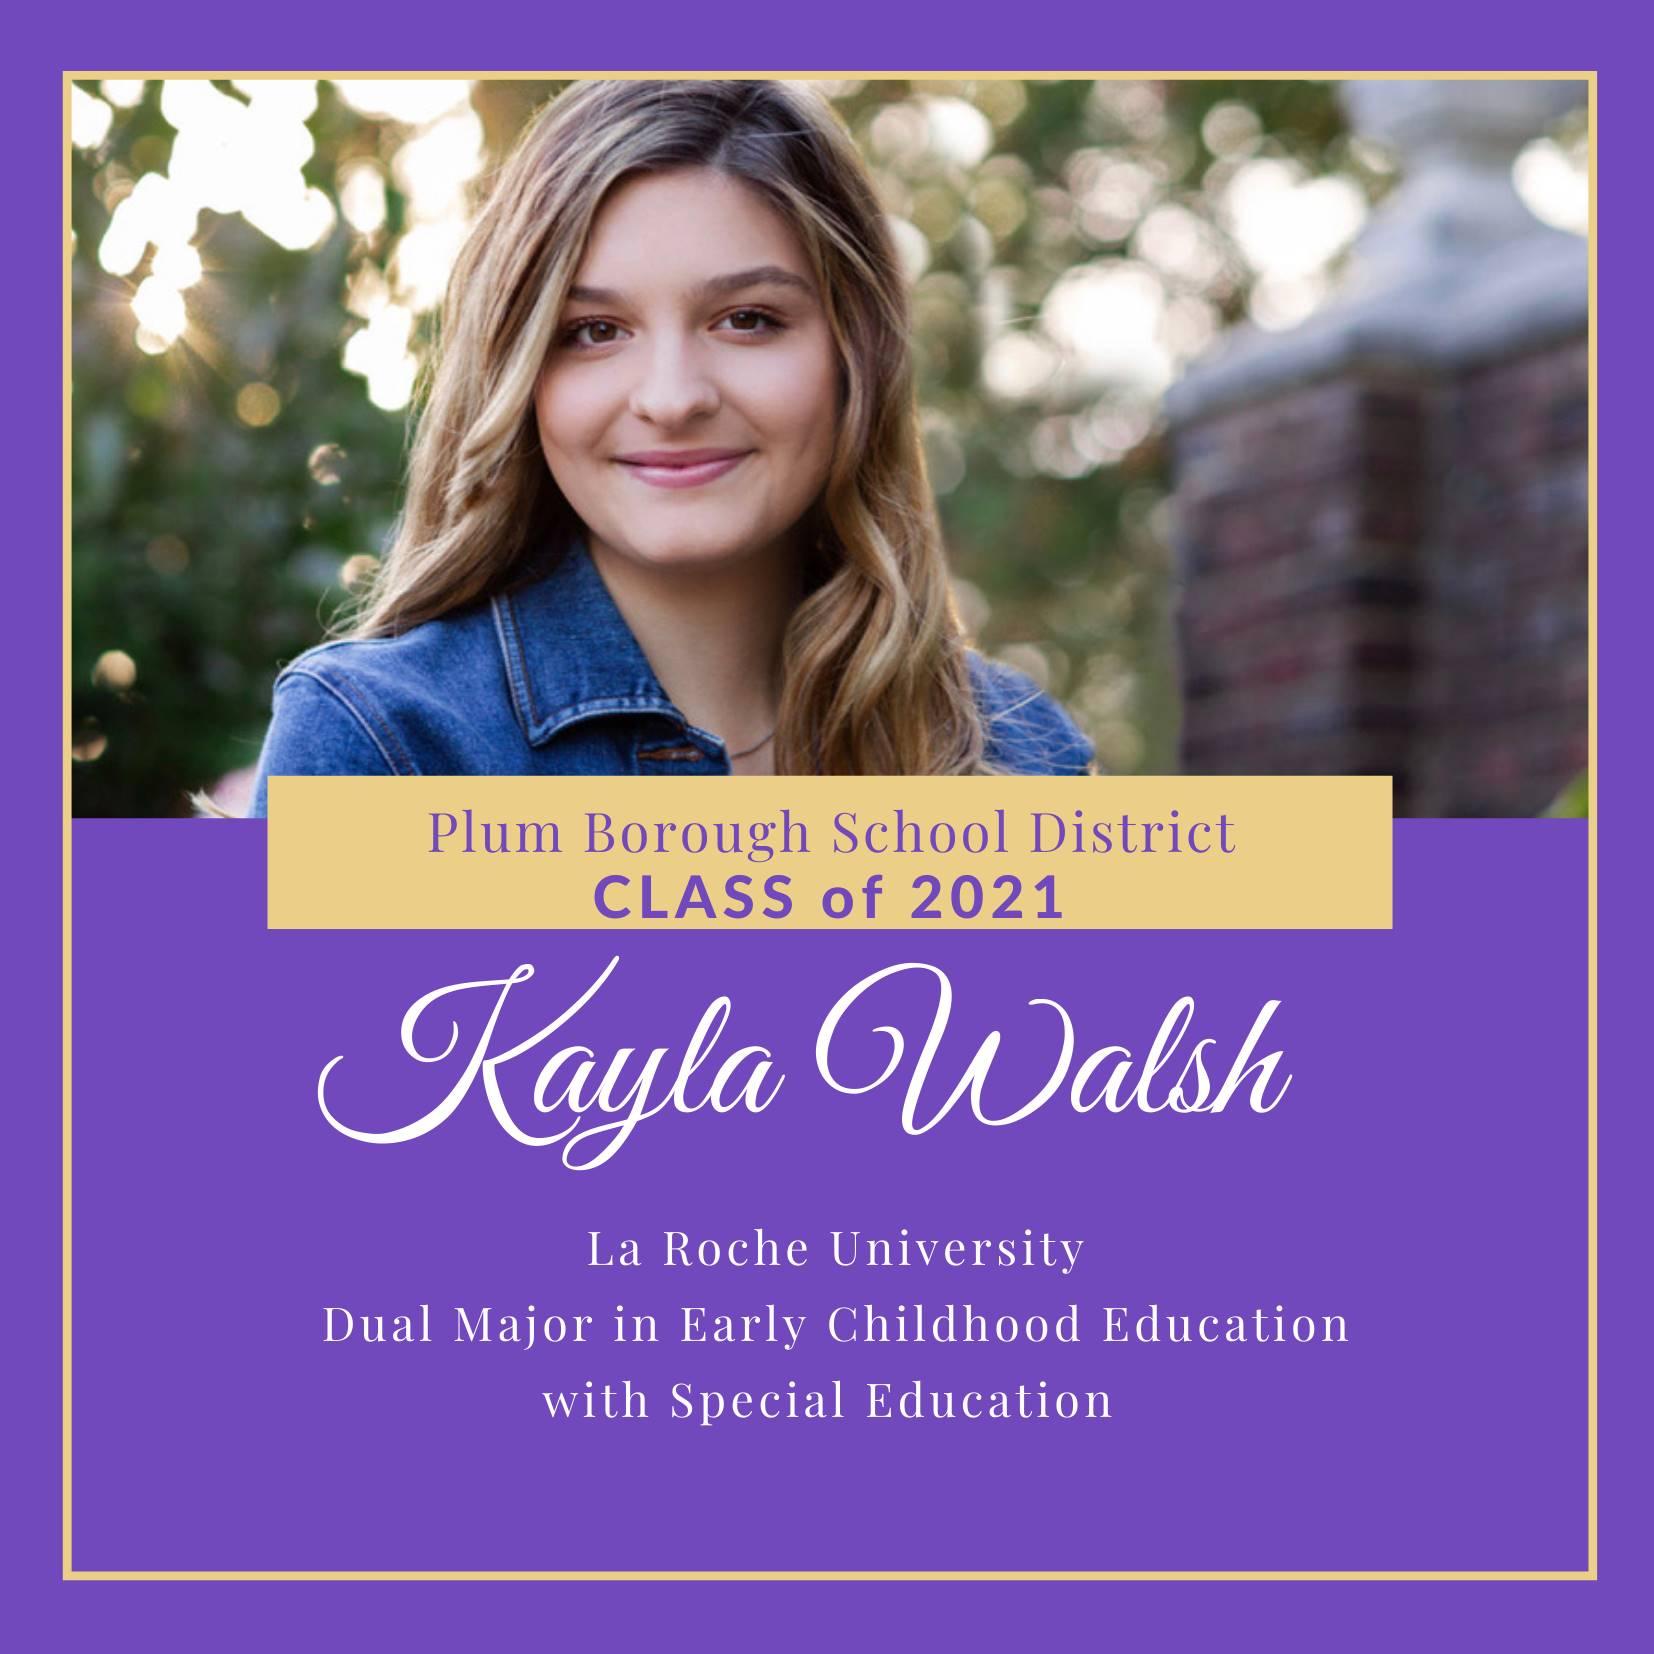 Congratulations to Kayla Walsh, Class of 2021!